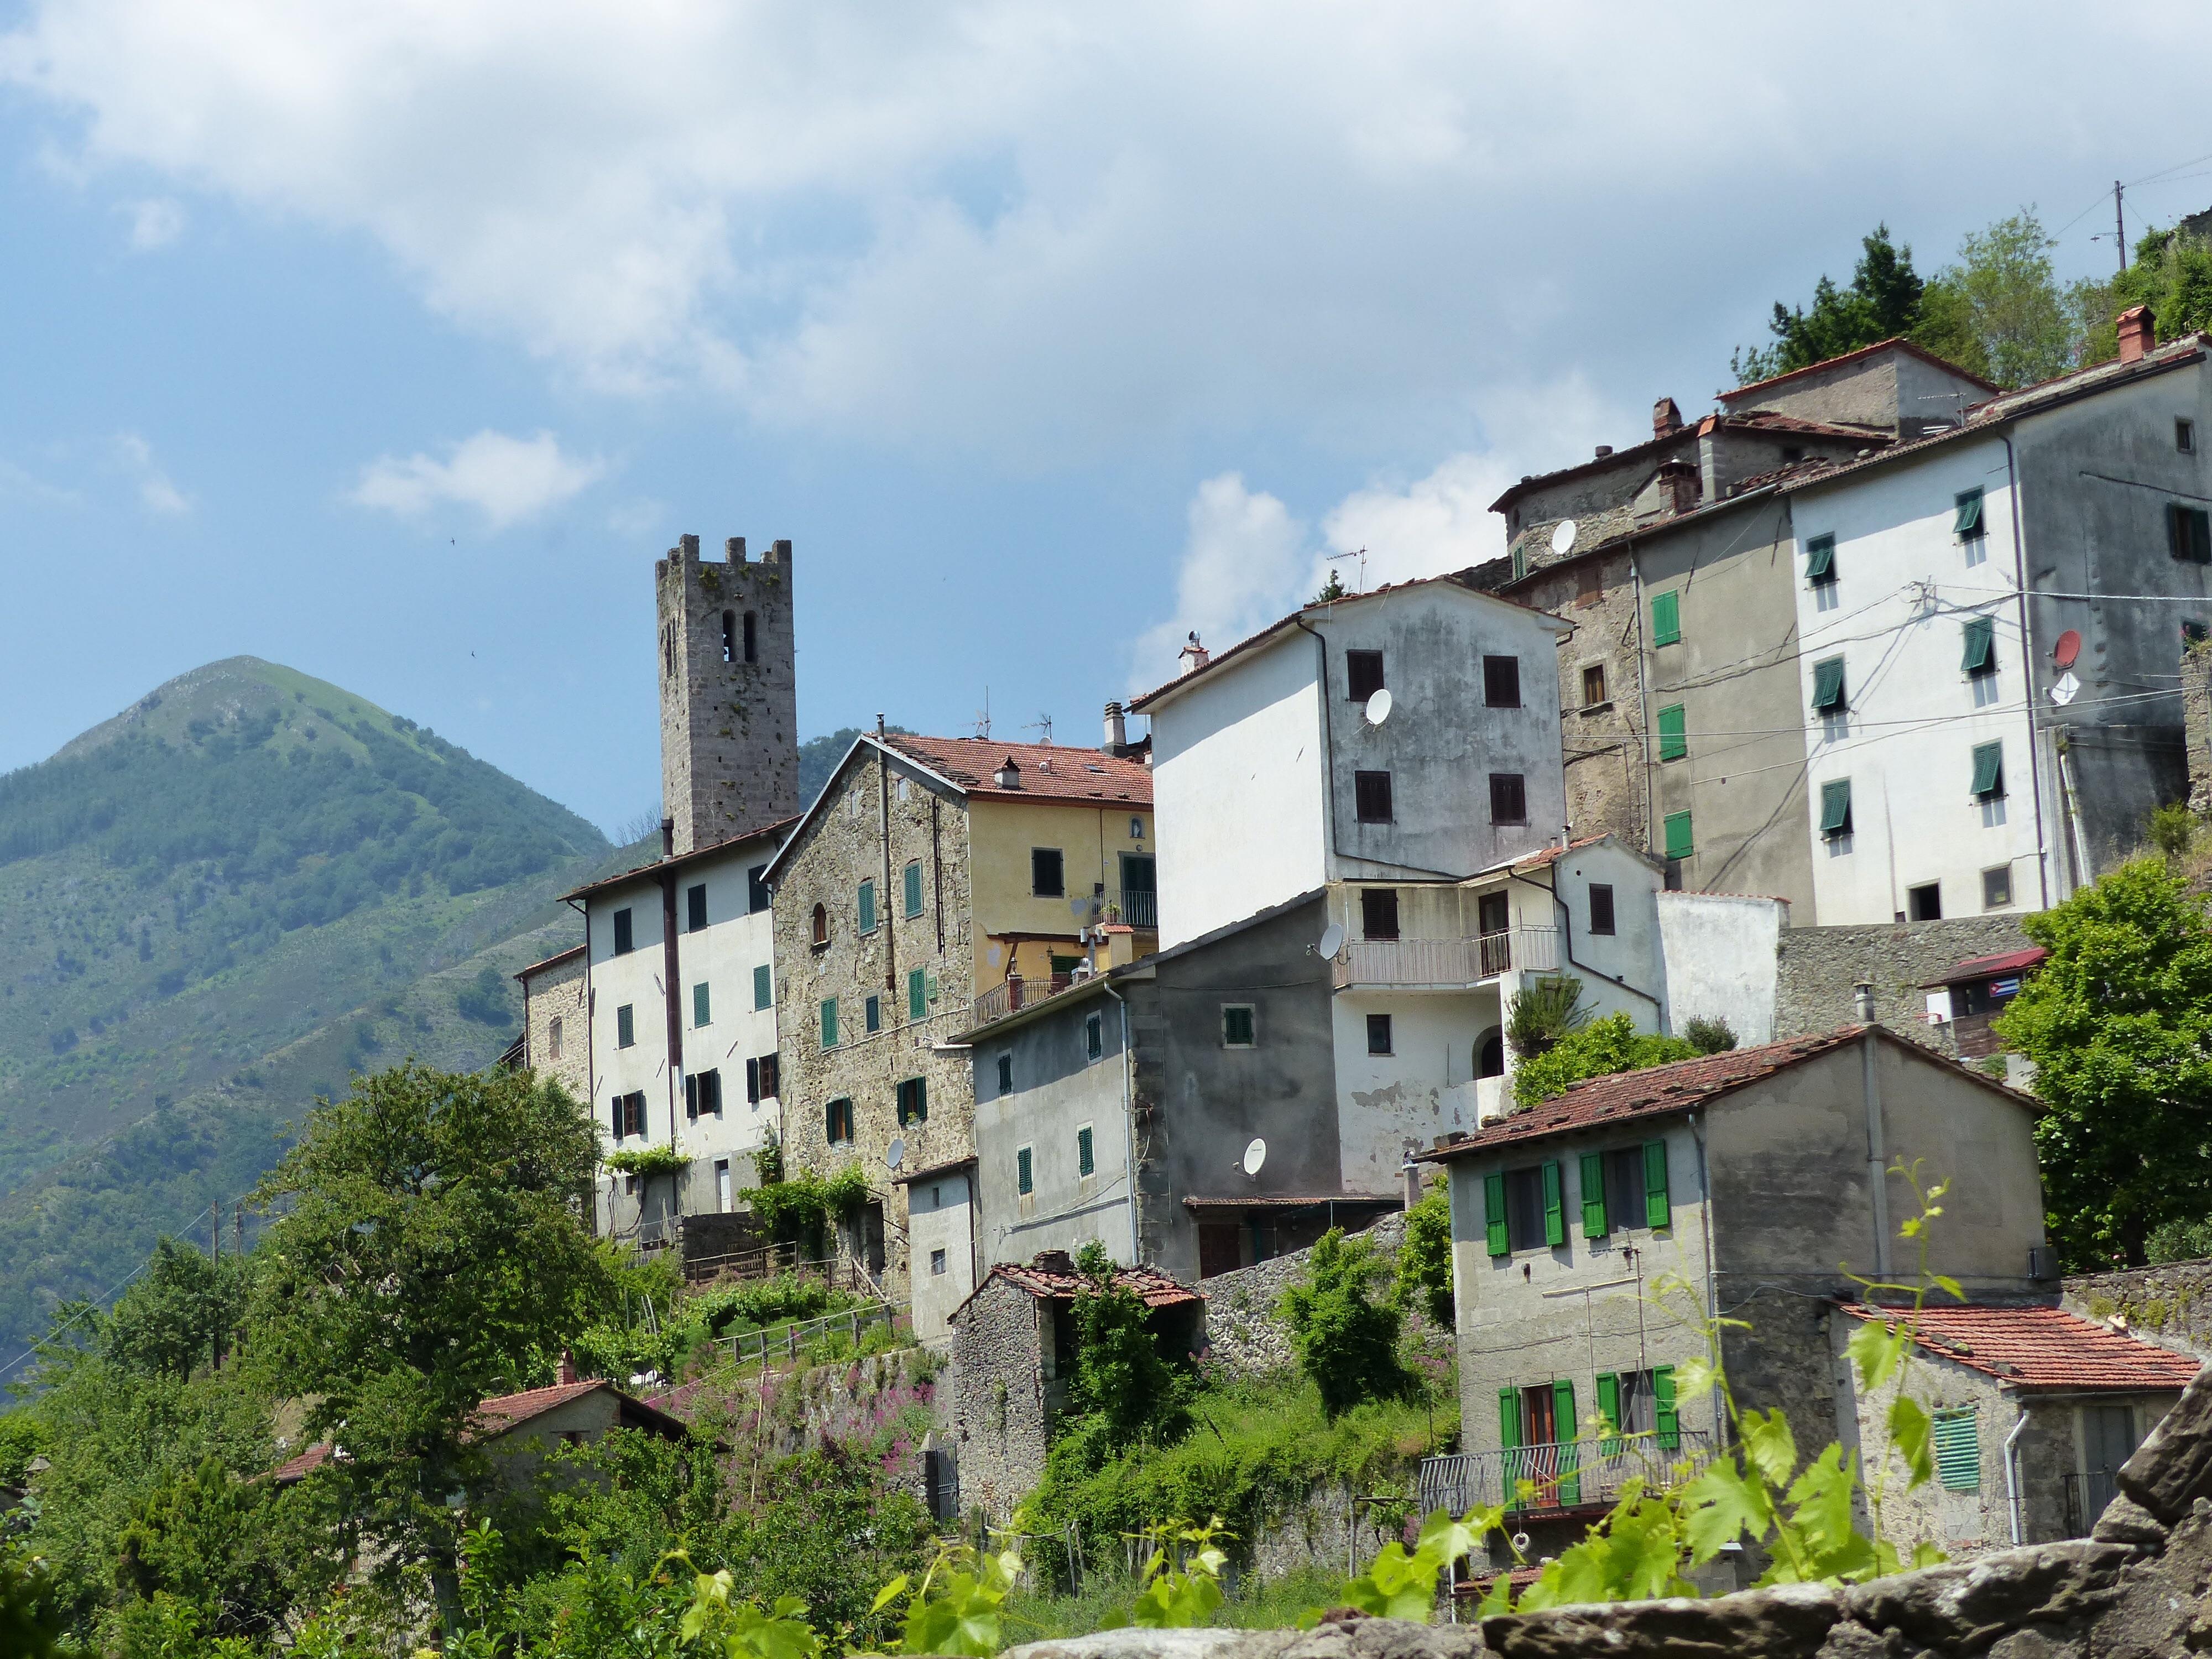 Back To Bagni Di Lucca